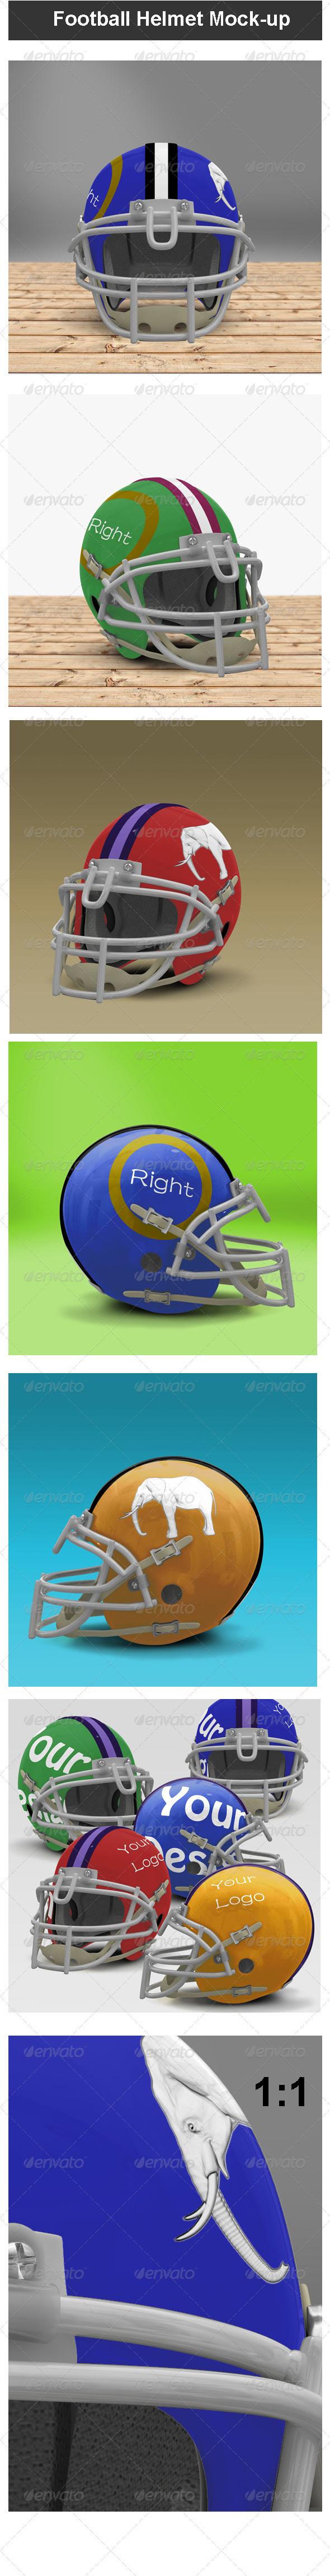 Football Helmet Mock-up - Miscellaneous Apparel